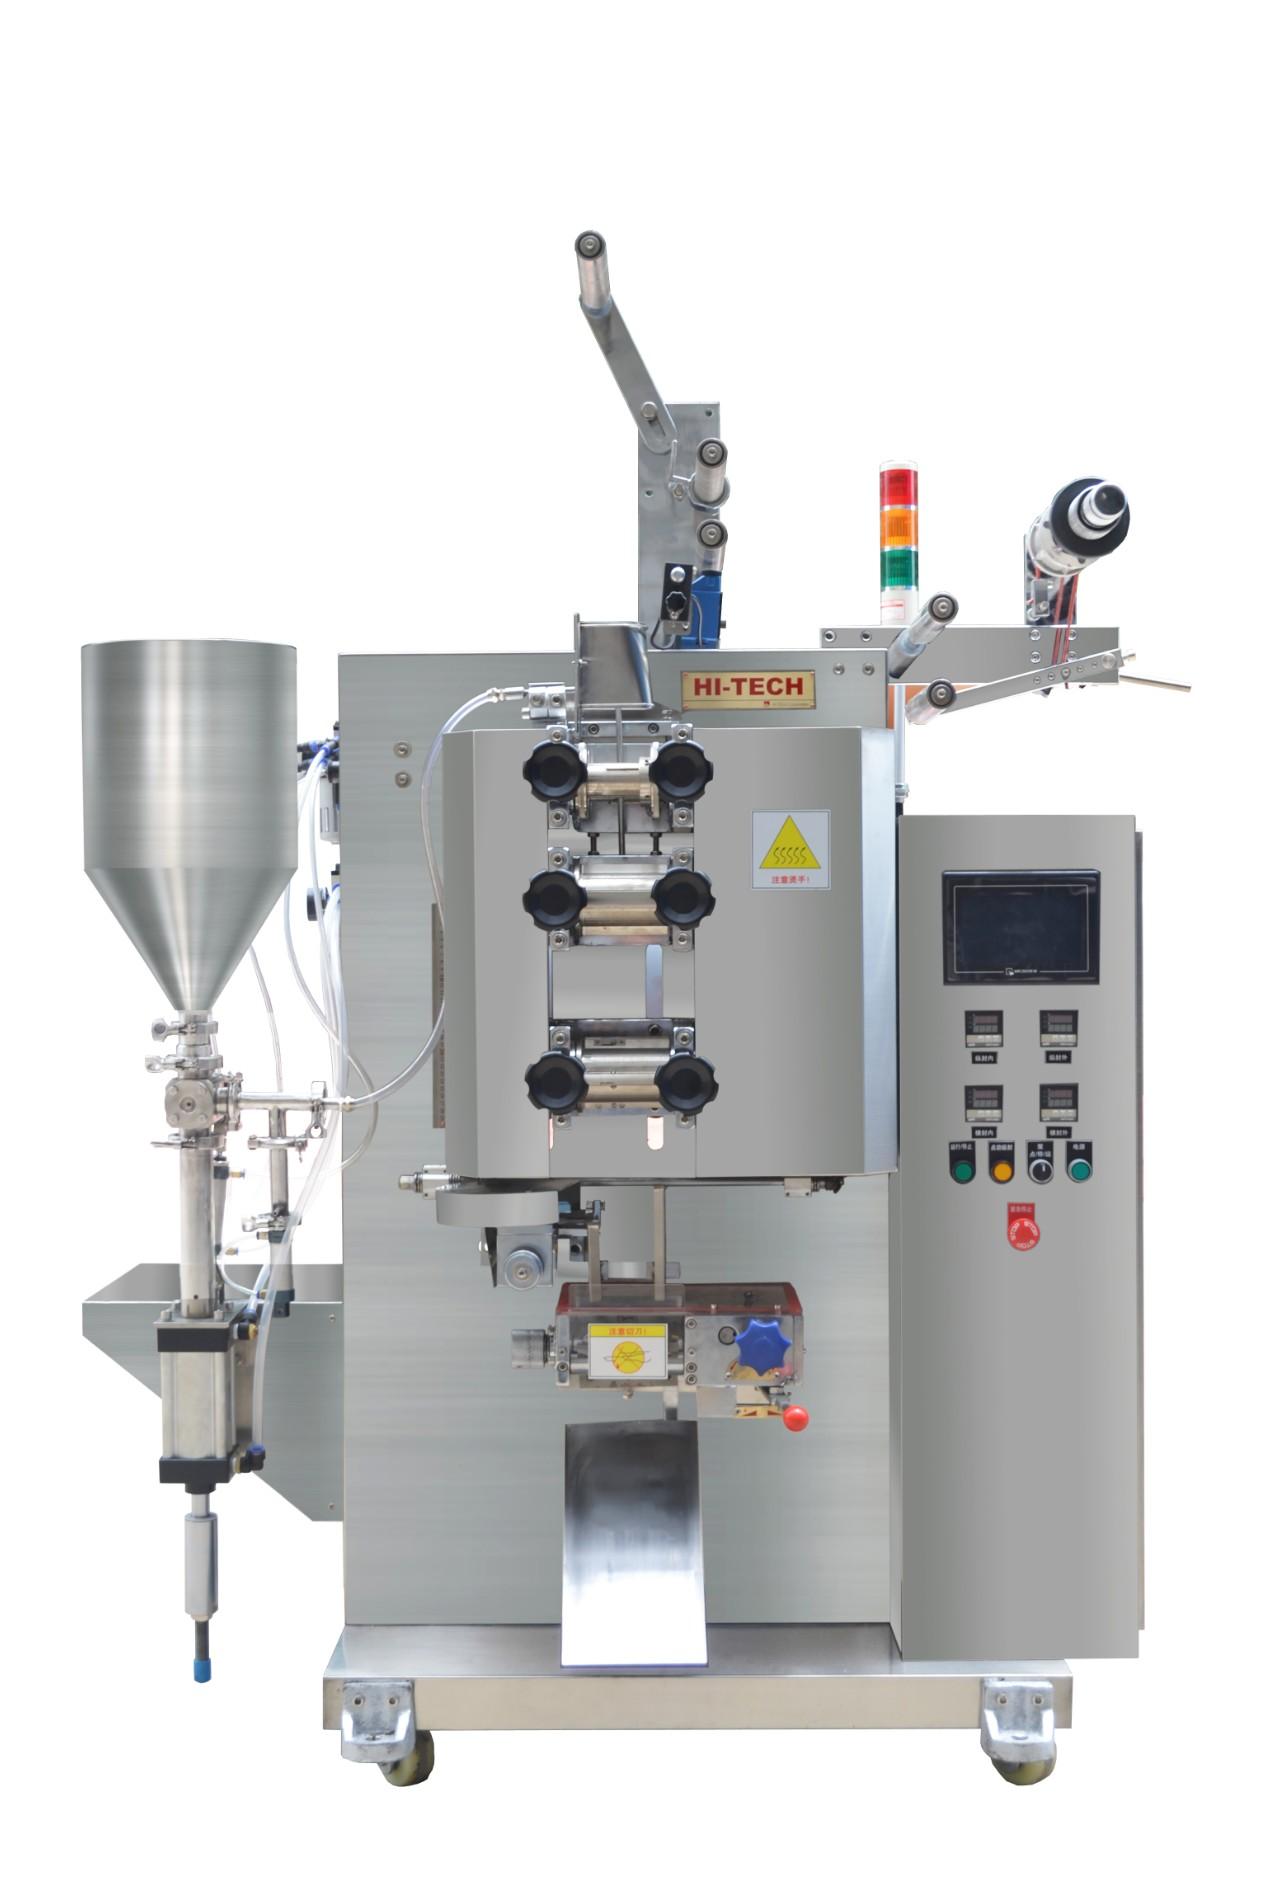 Automactic Liquid Oil And Packing Machine Manufacturers, Automactic Liquid Oil And Packing Machine Factory, Supply Automactic Liquid Oil And Packing Machine